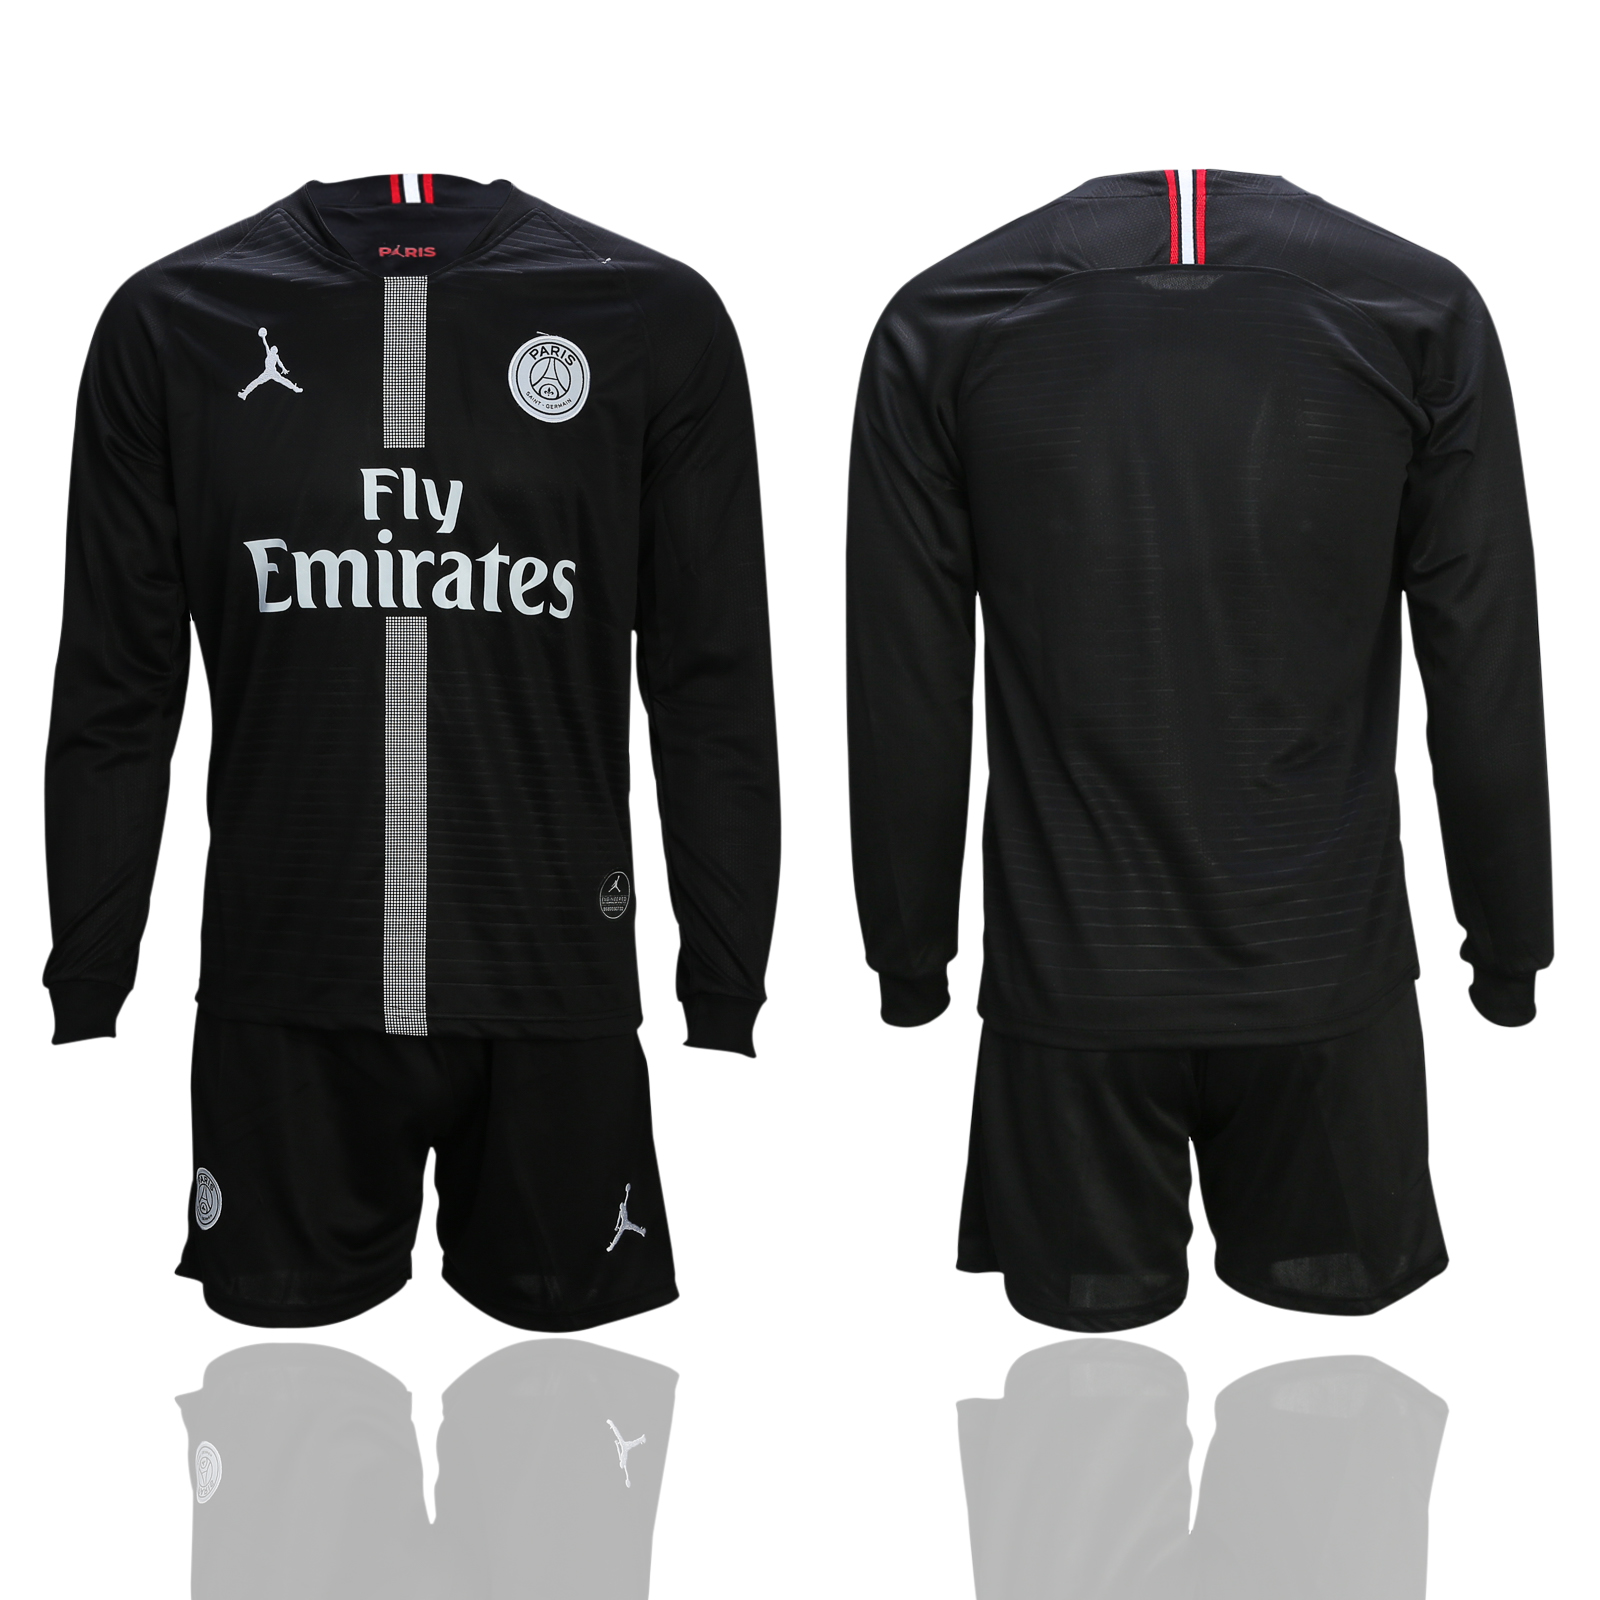 2018-19 Paris Saint-Germain Black UEFA Champions League Long Sleeve Soccer Jersey